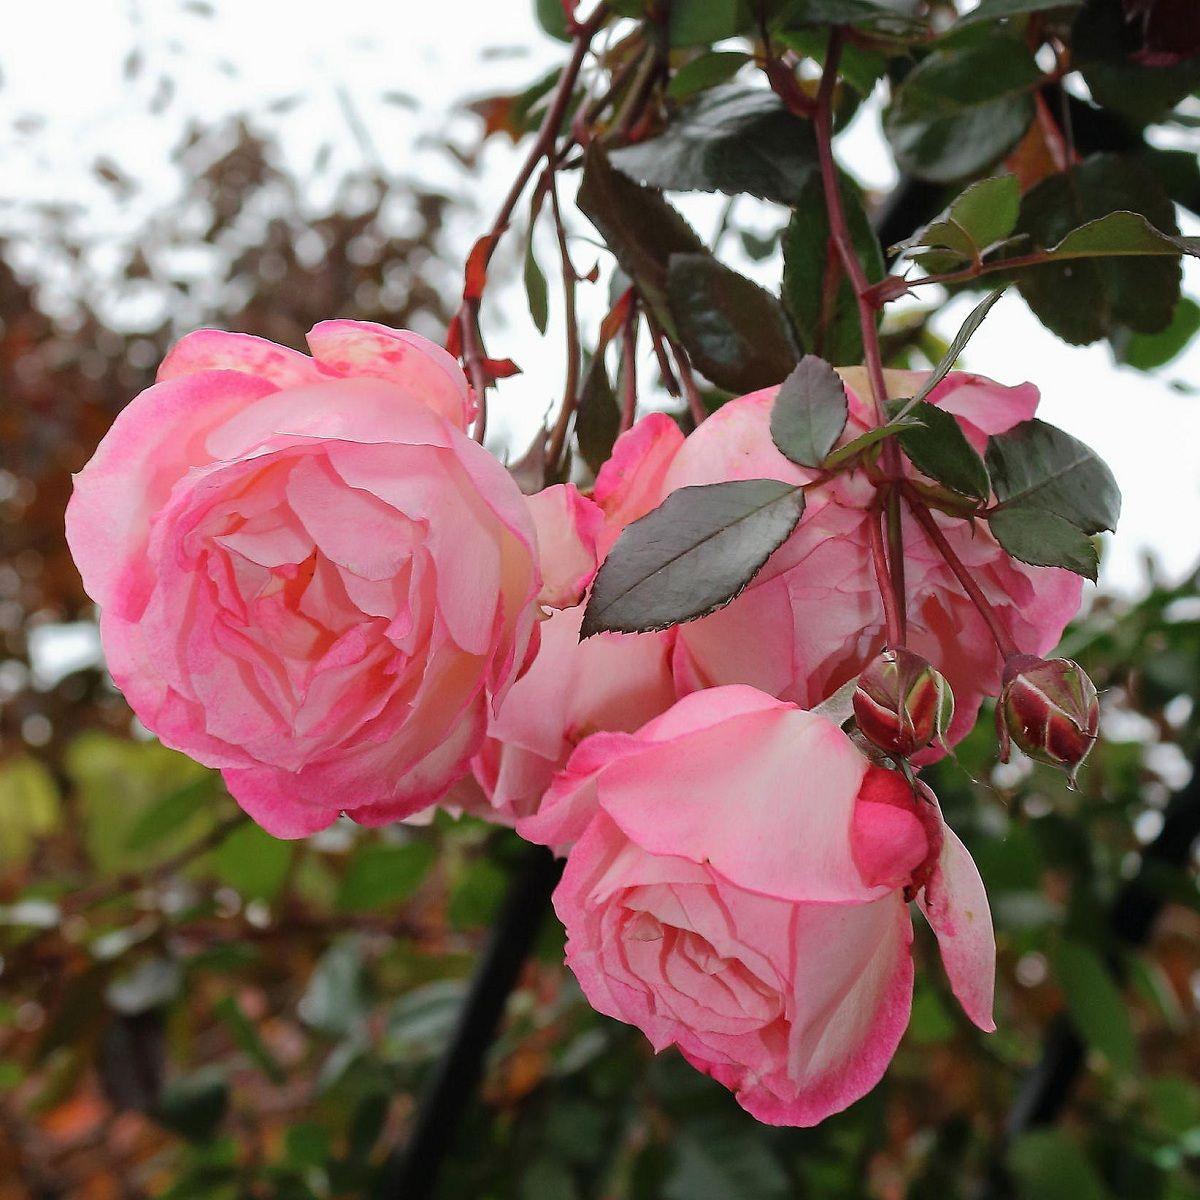 The desire, the capacity to enjoy, is an instinct; the love of #Roses is innate #Pink #Garden #flowers #Florist #flowerphoto #Flowerphotography #Flowersofinstagram #picoftheday #lovelyflowers #instacool #bestoftheday #photooftheday #flowersofinsta #flowerlove #flowerpower #nature #Inspiration #NZ